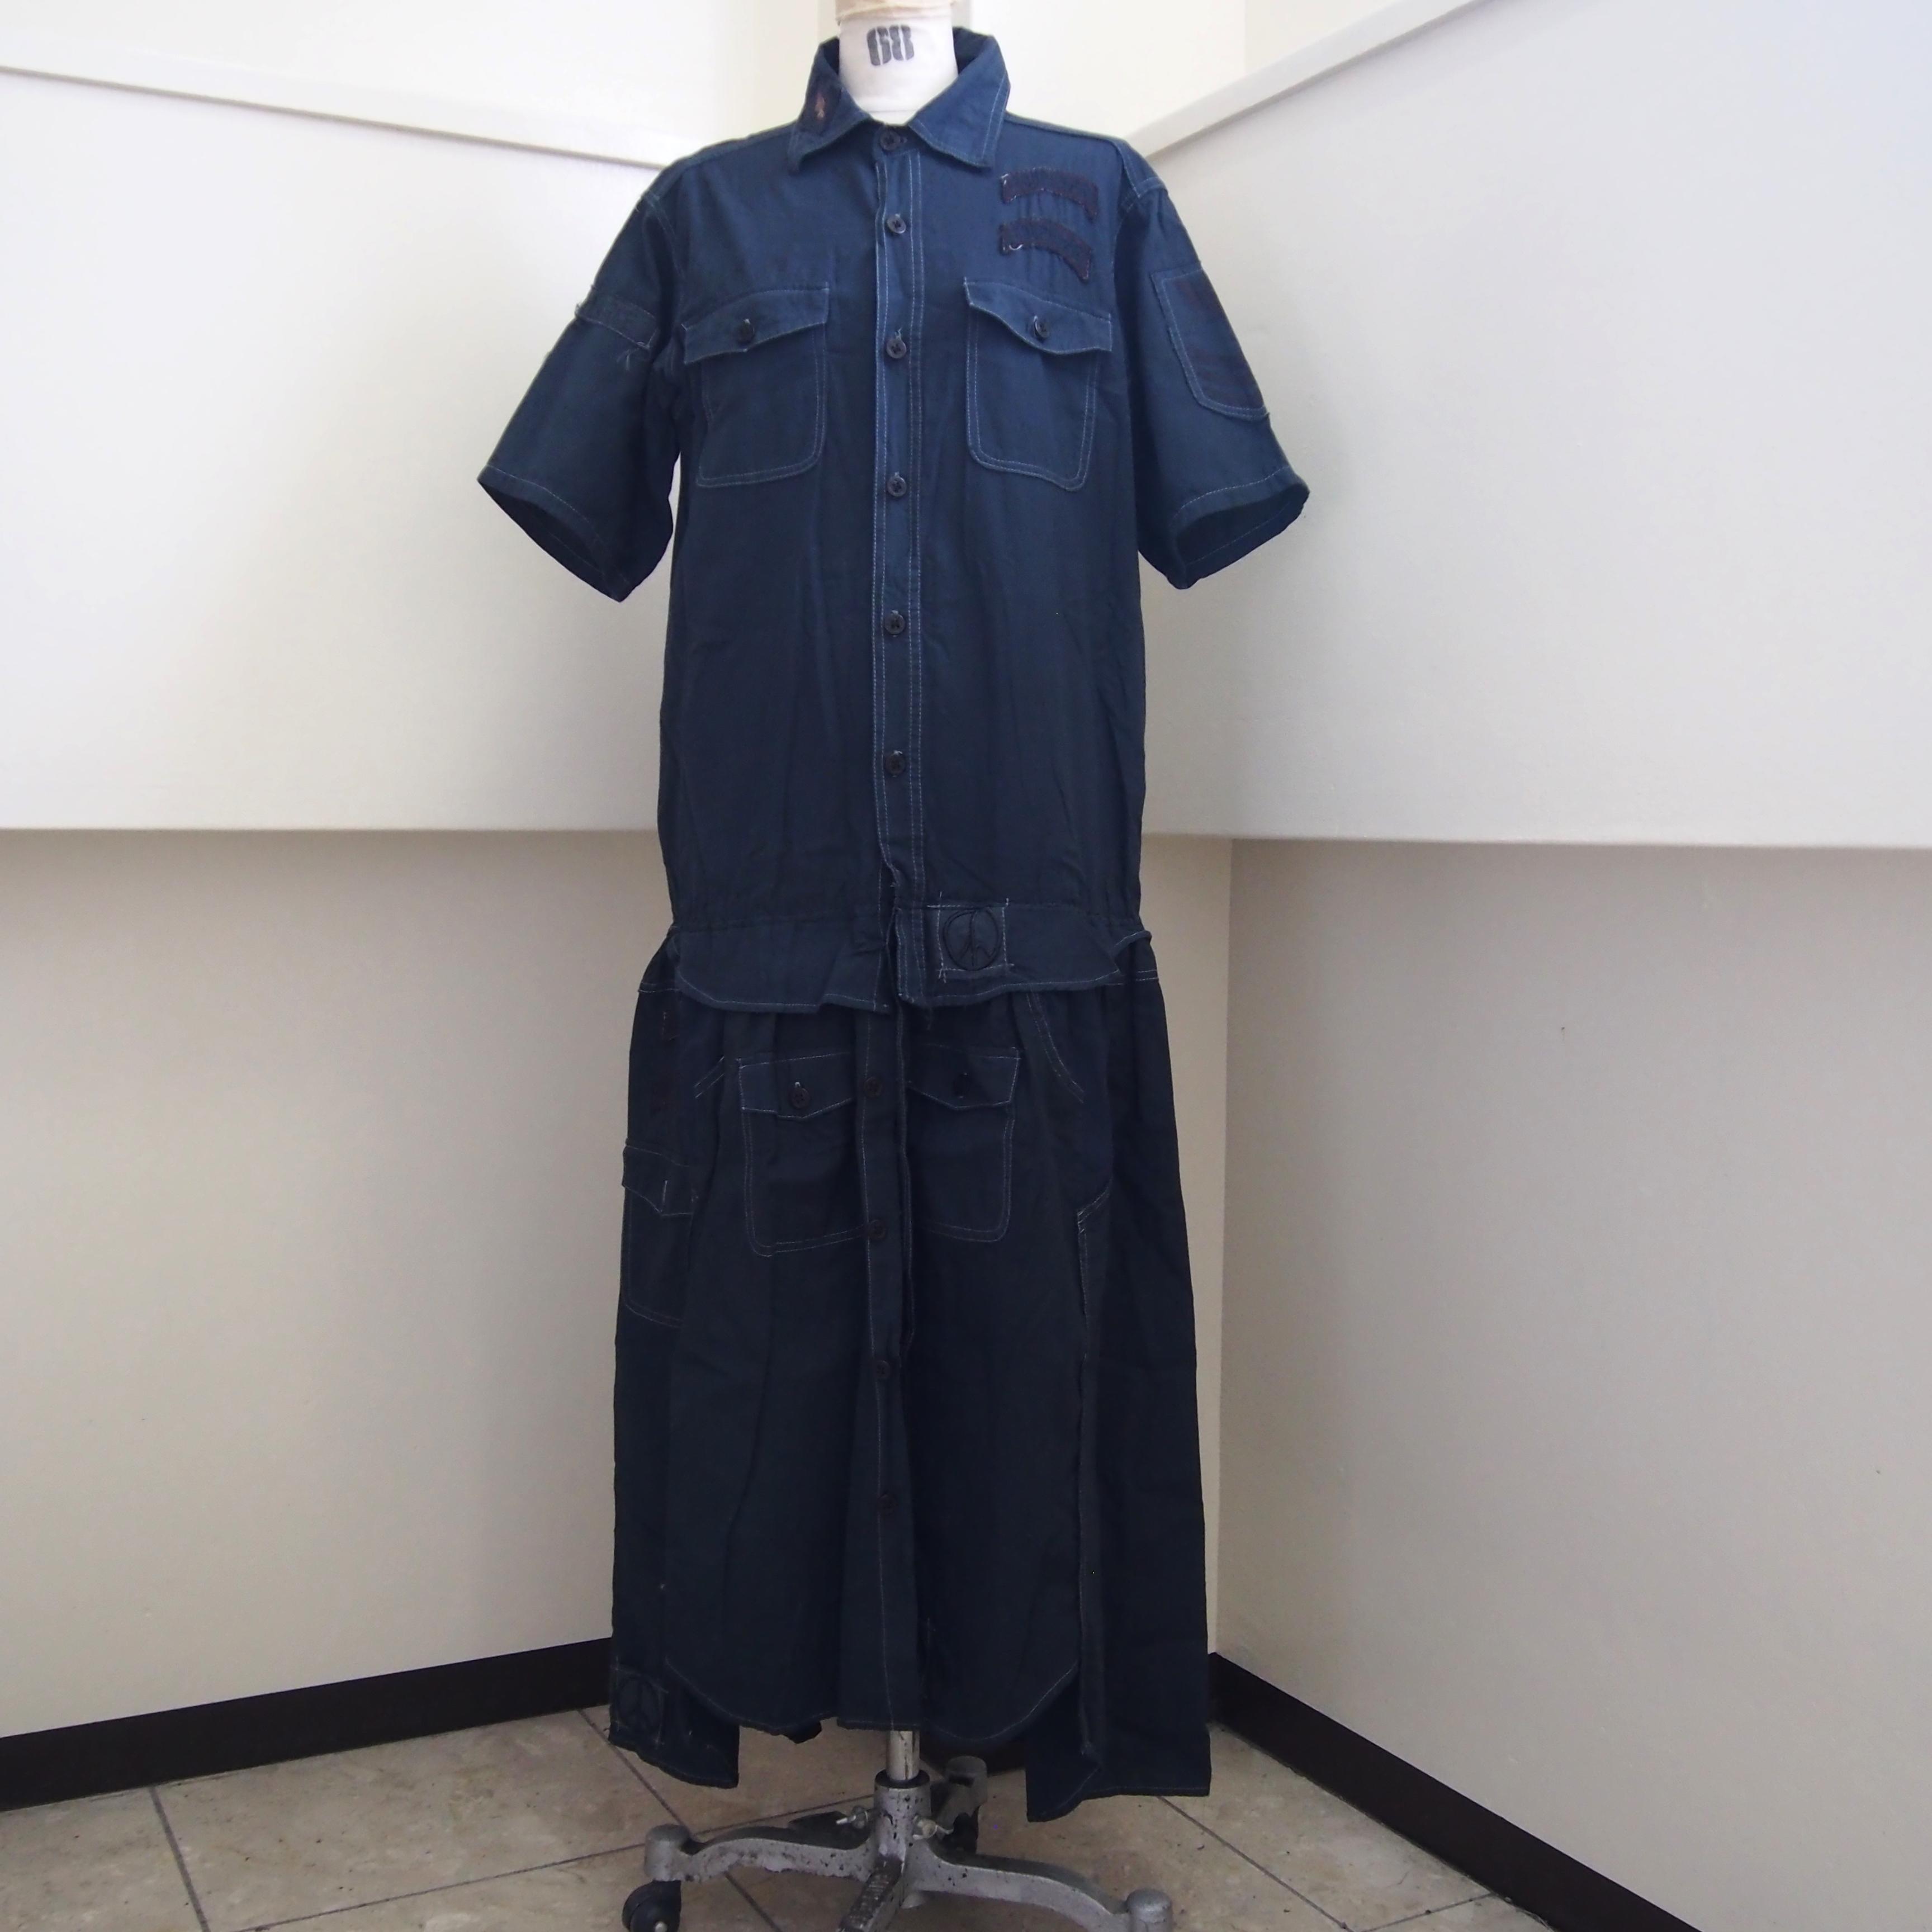 【sandglass】dark night shirt custom one piece(A) / 【サンドグラス】ダークナイト シャツ カスタム ワンピース(A)